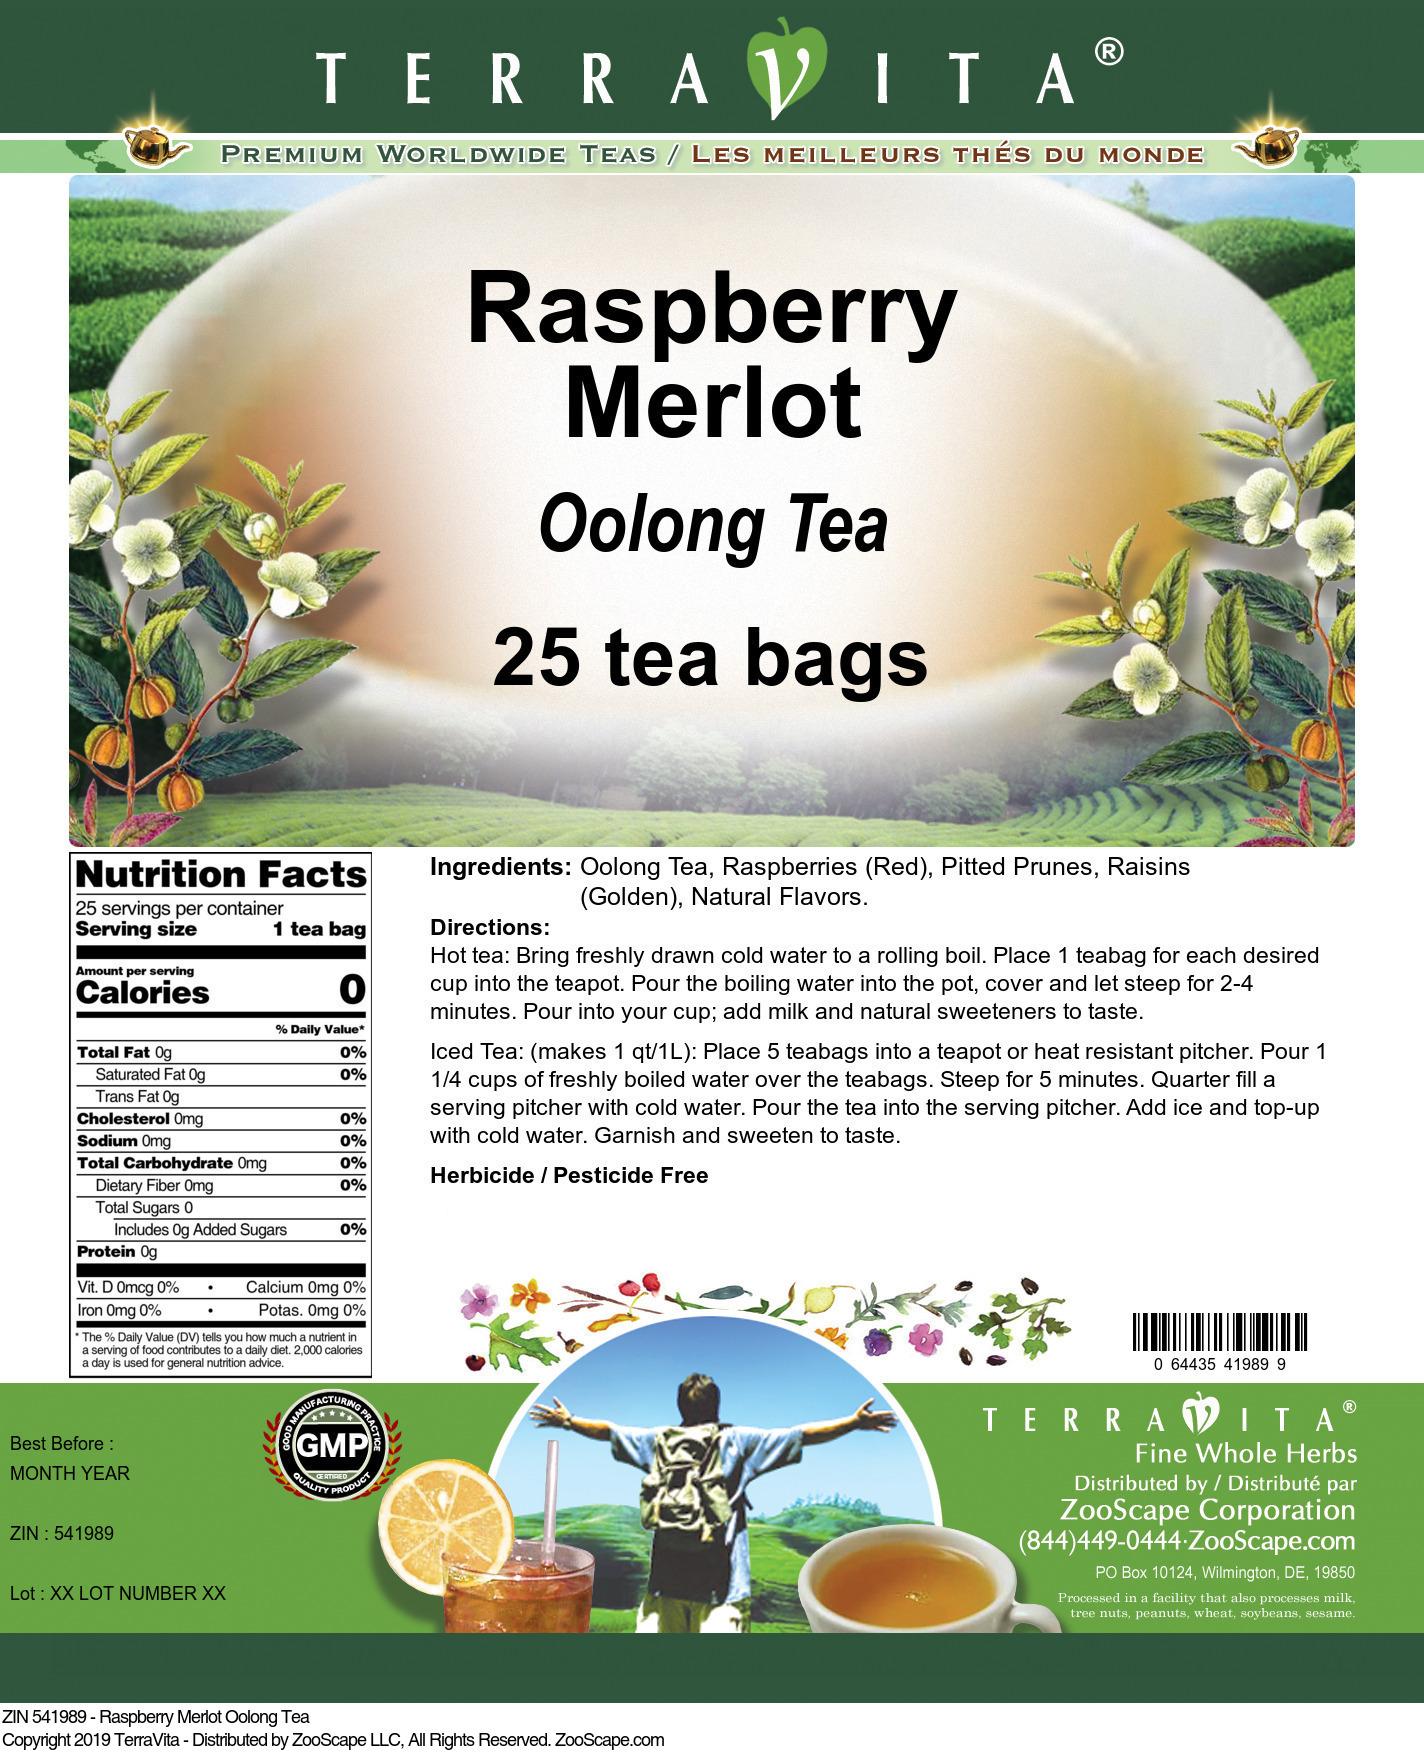 Raspberry Merlot Oolong Tea